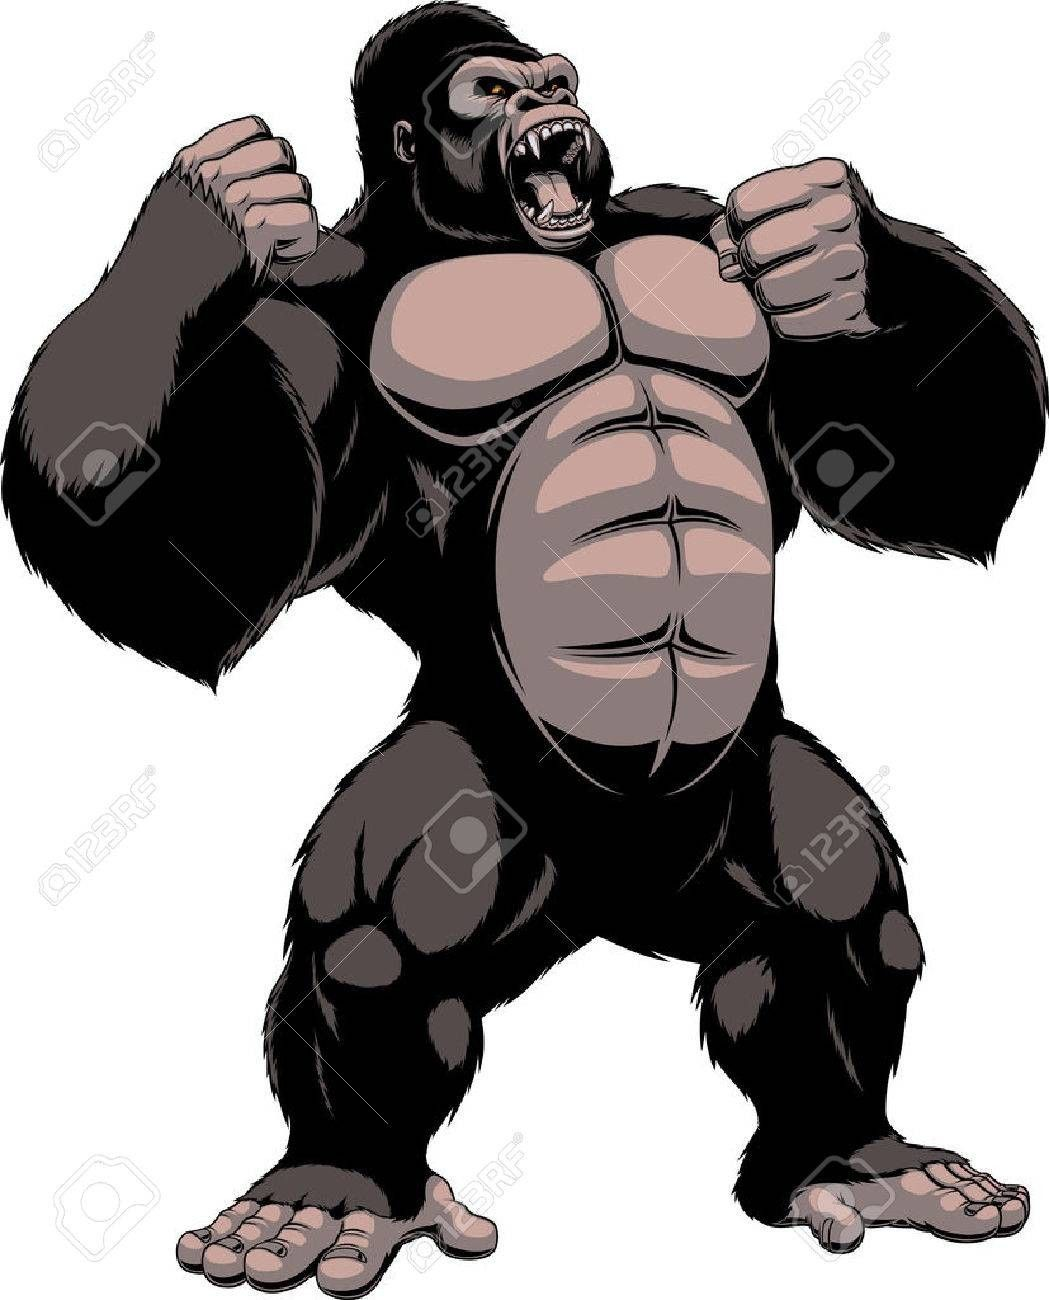 King Kong Gorilla Illustration Gorillas Art Creature Drawings